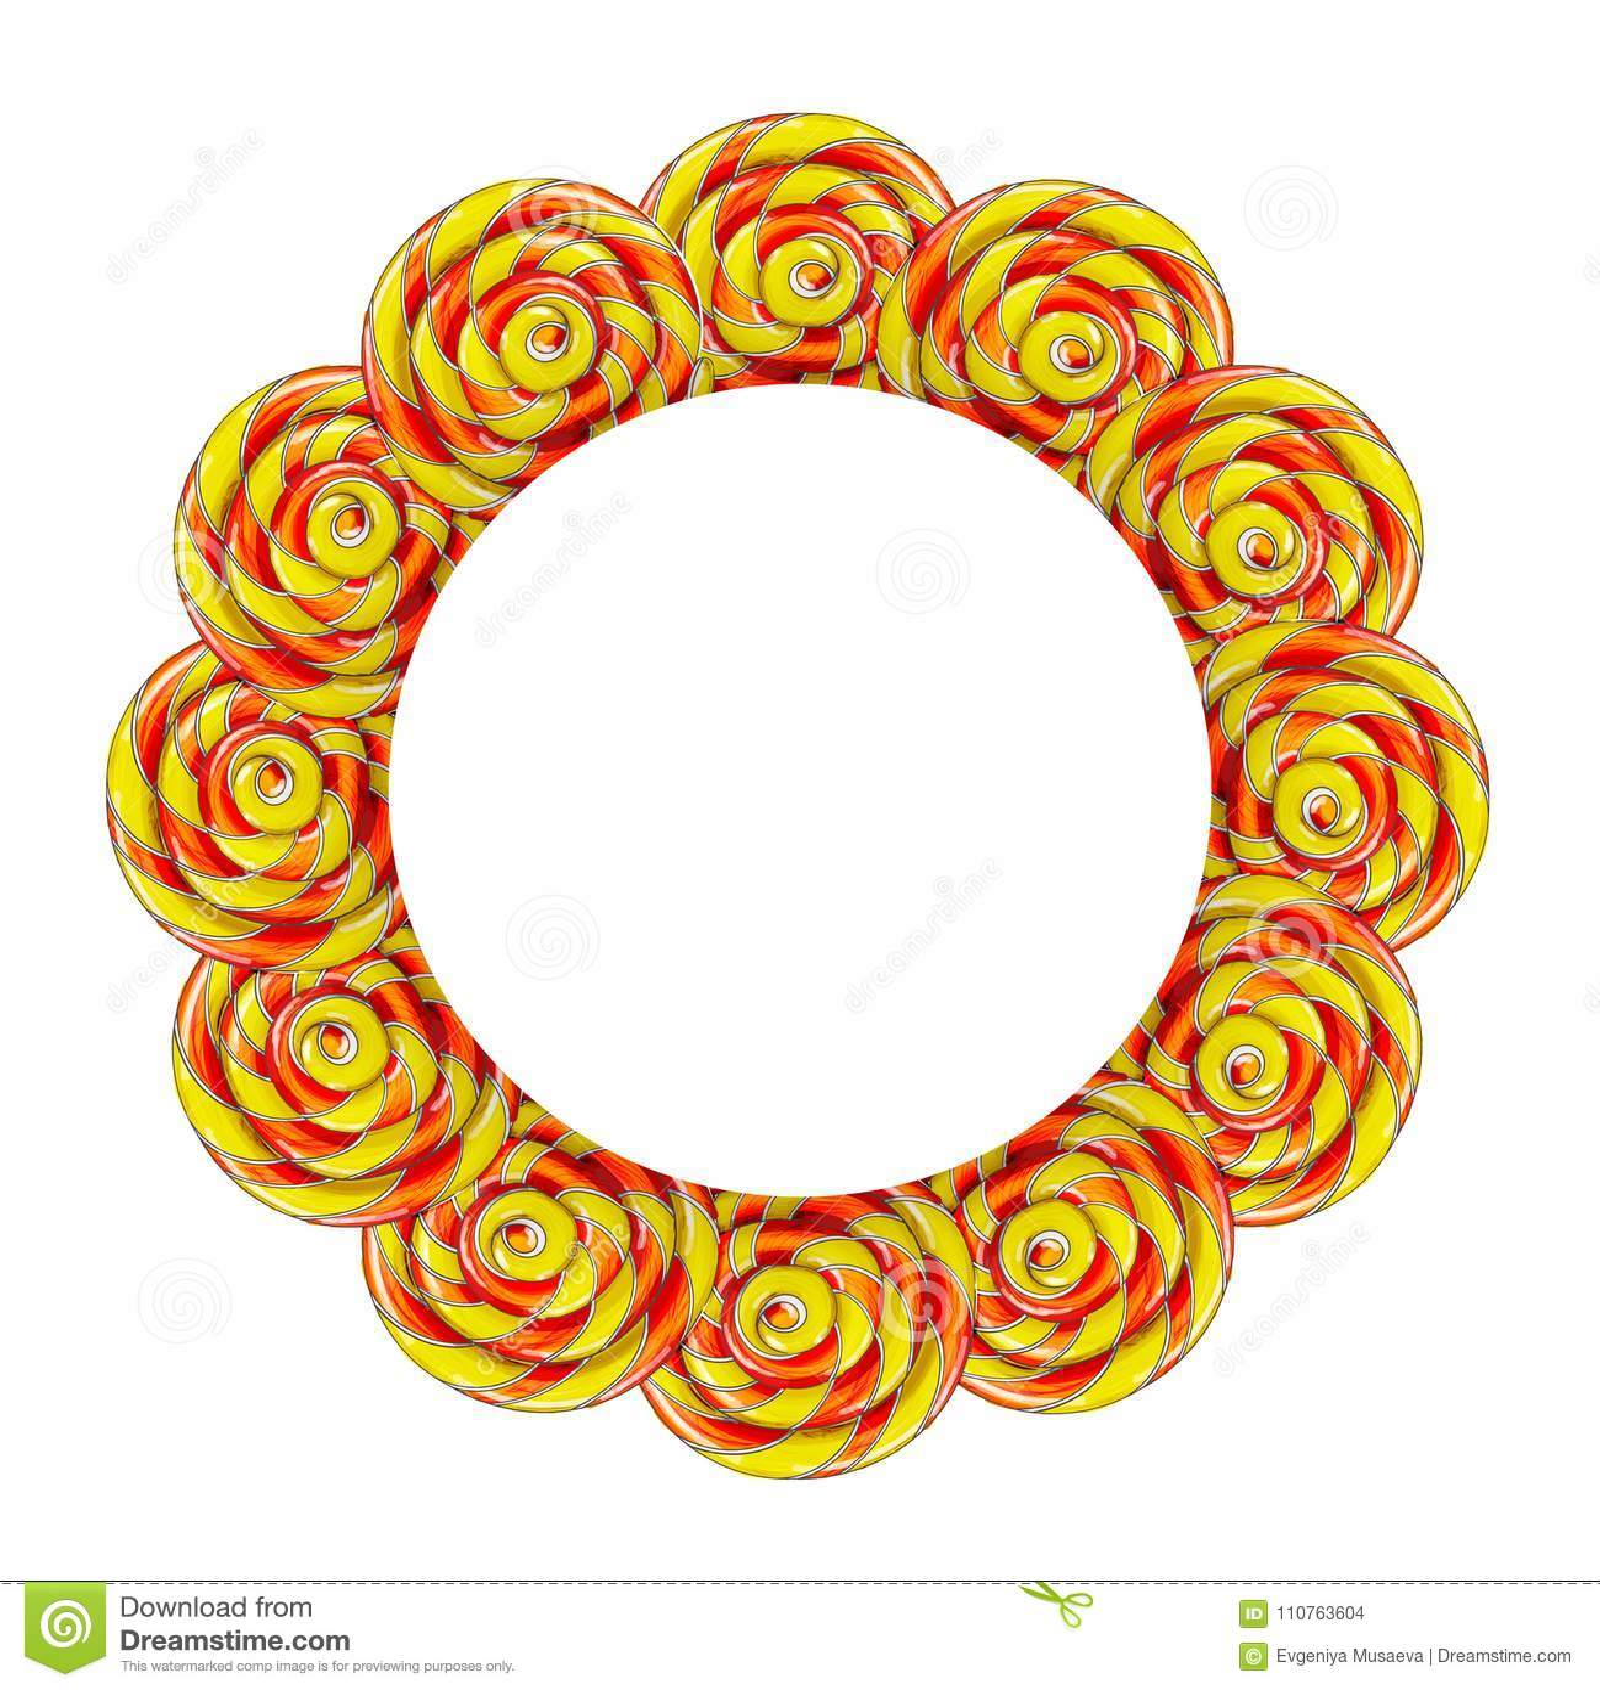 Quadro do círculo feito de doces coloridos do pirulito